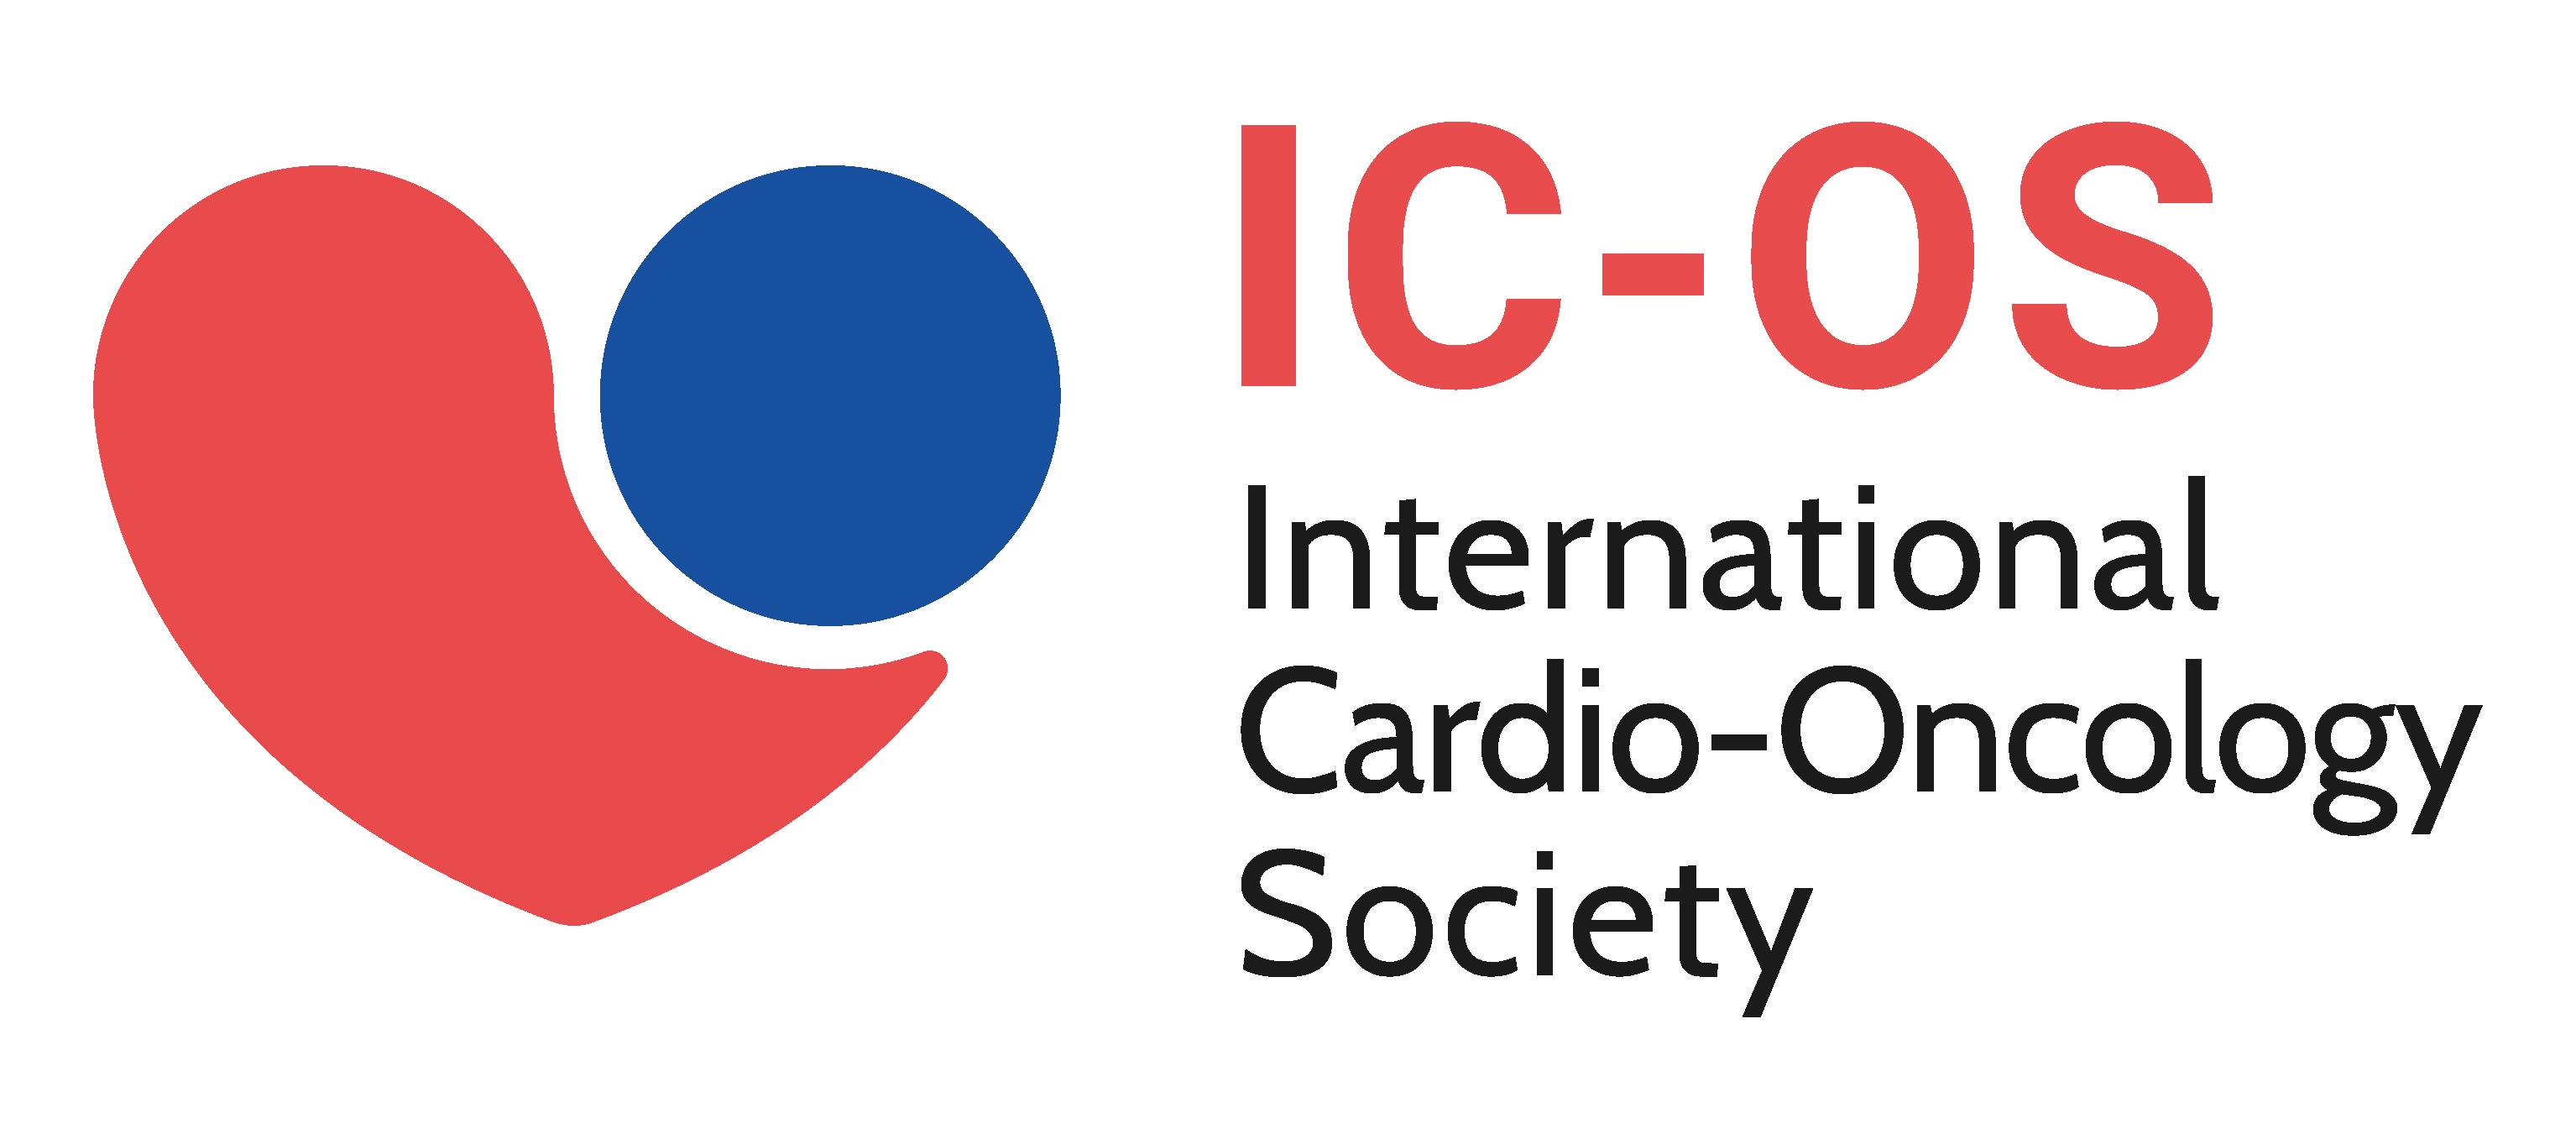 International CardioOncology Society